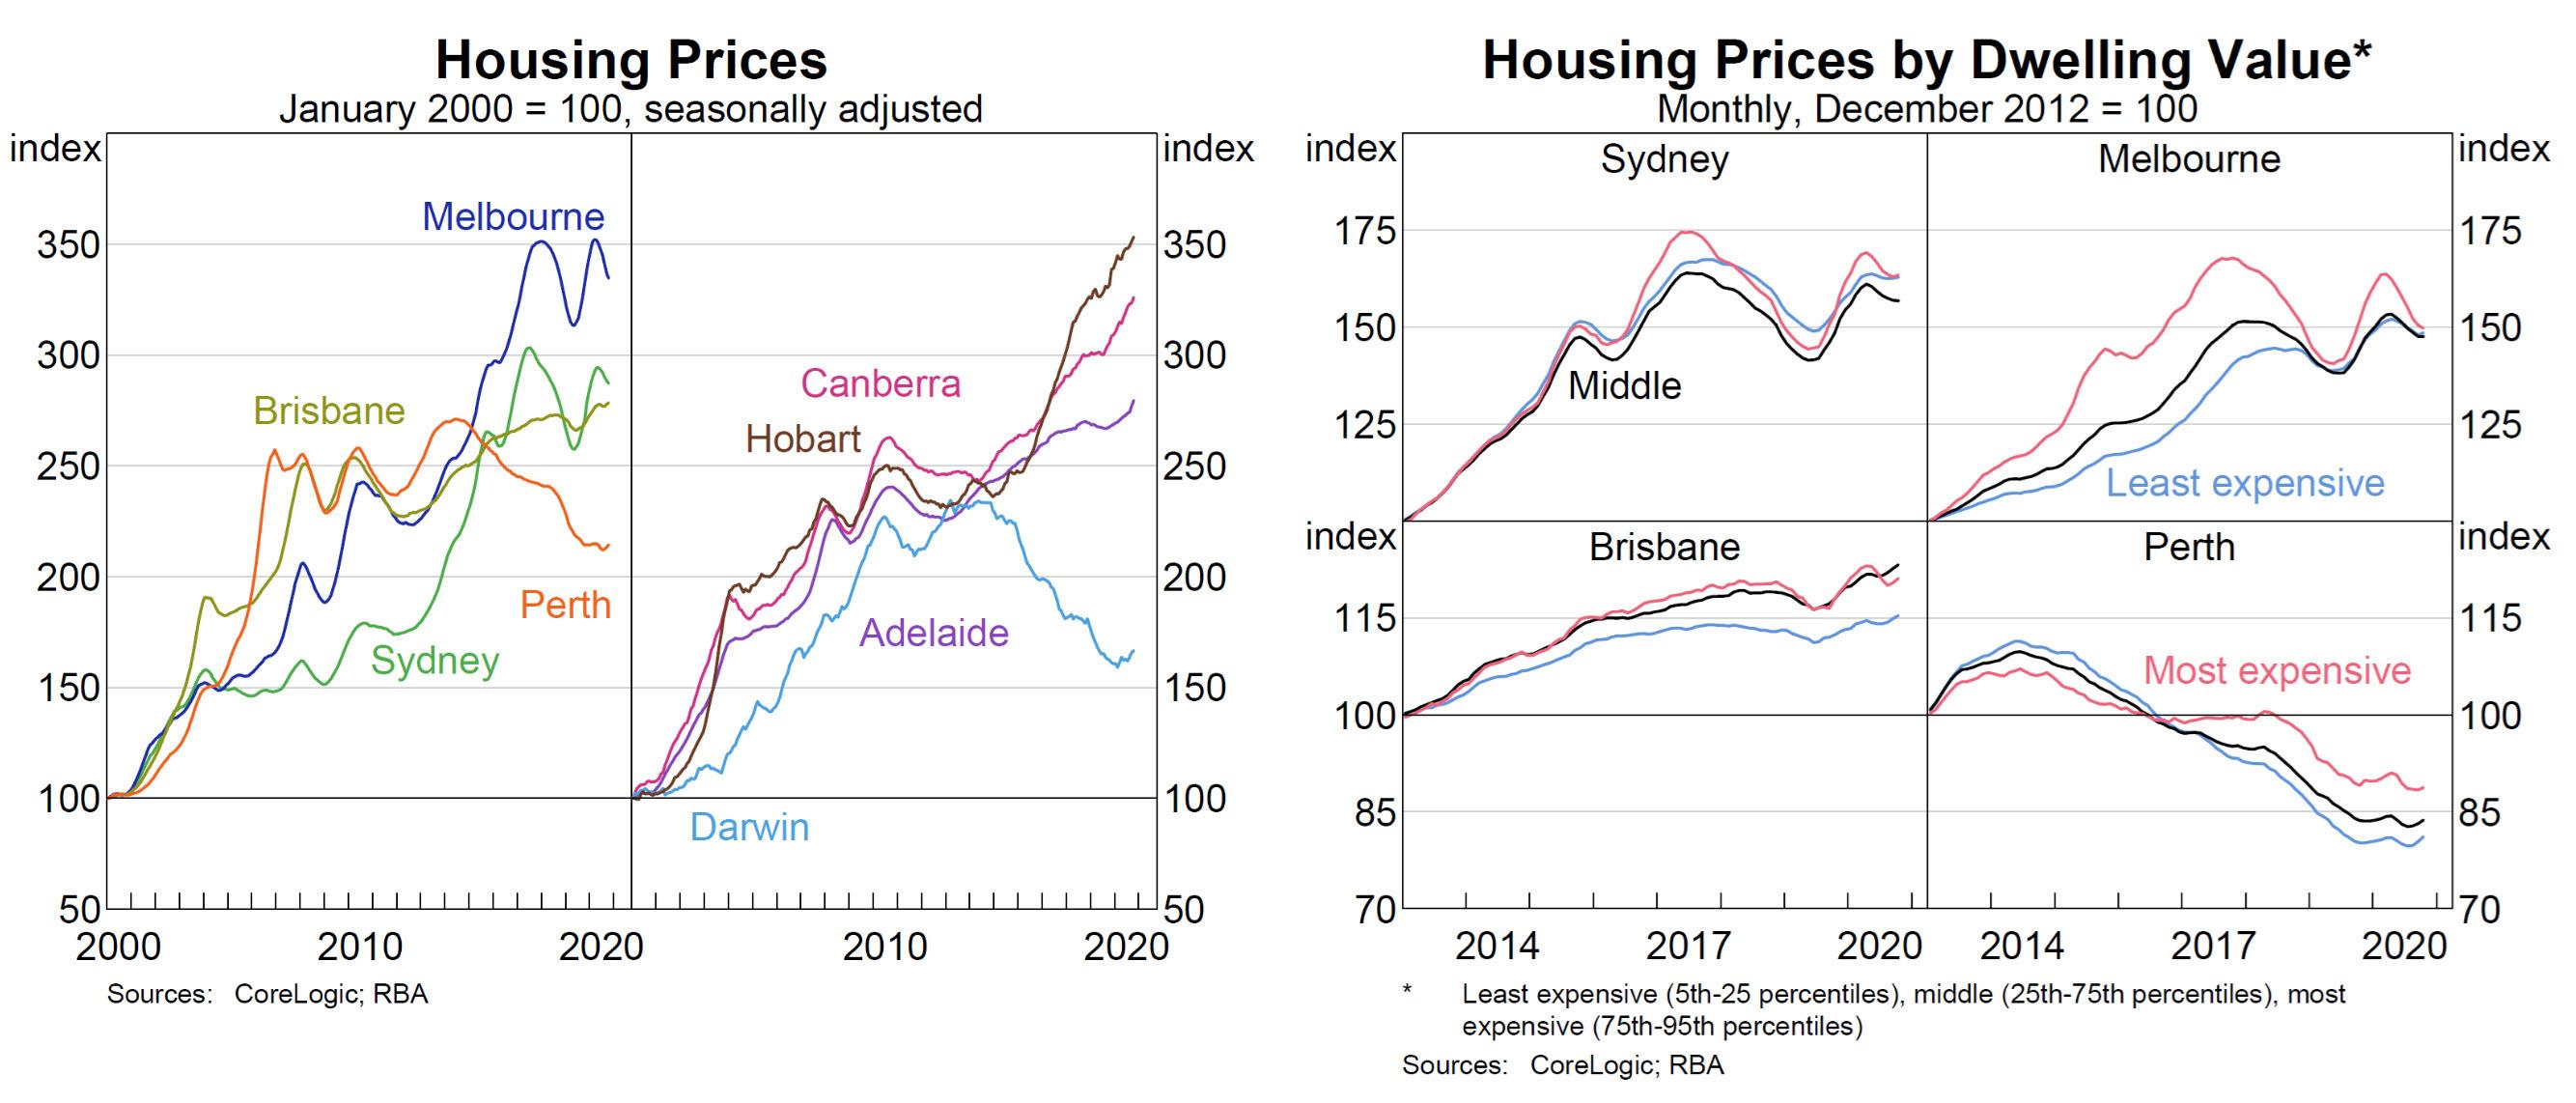 Housing Prices Graphs